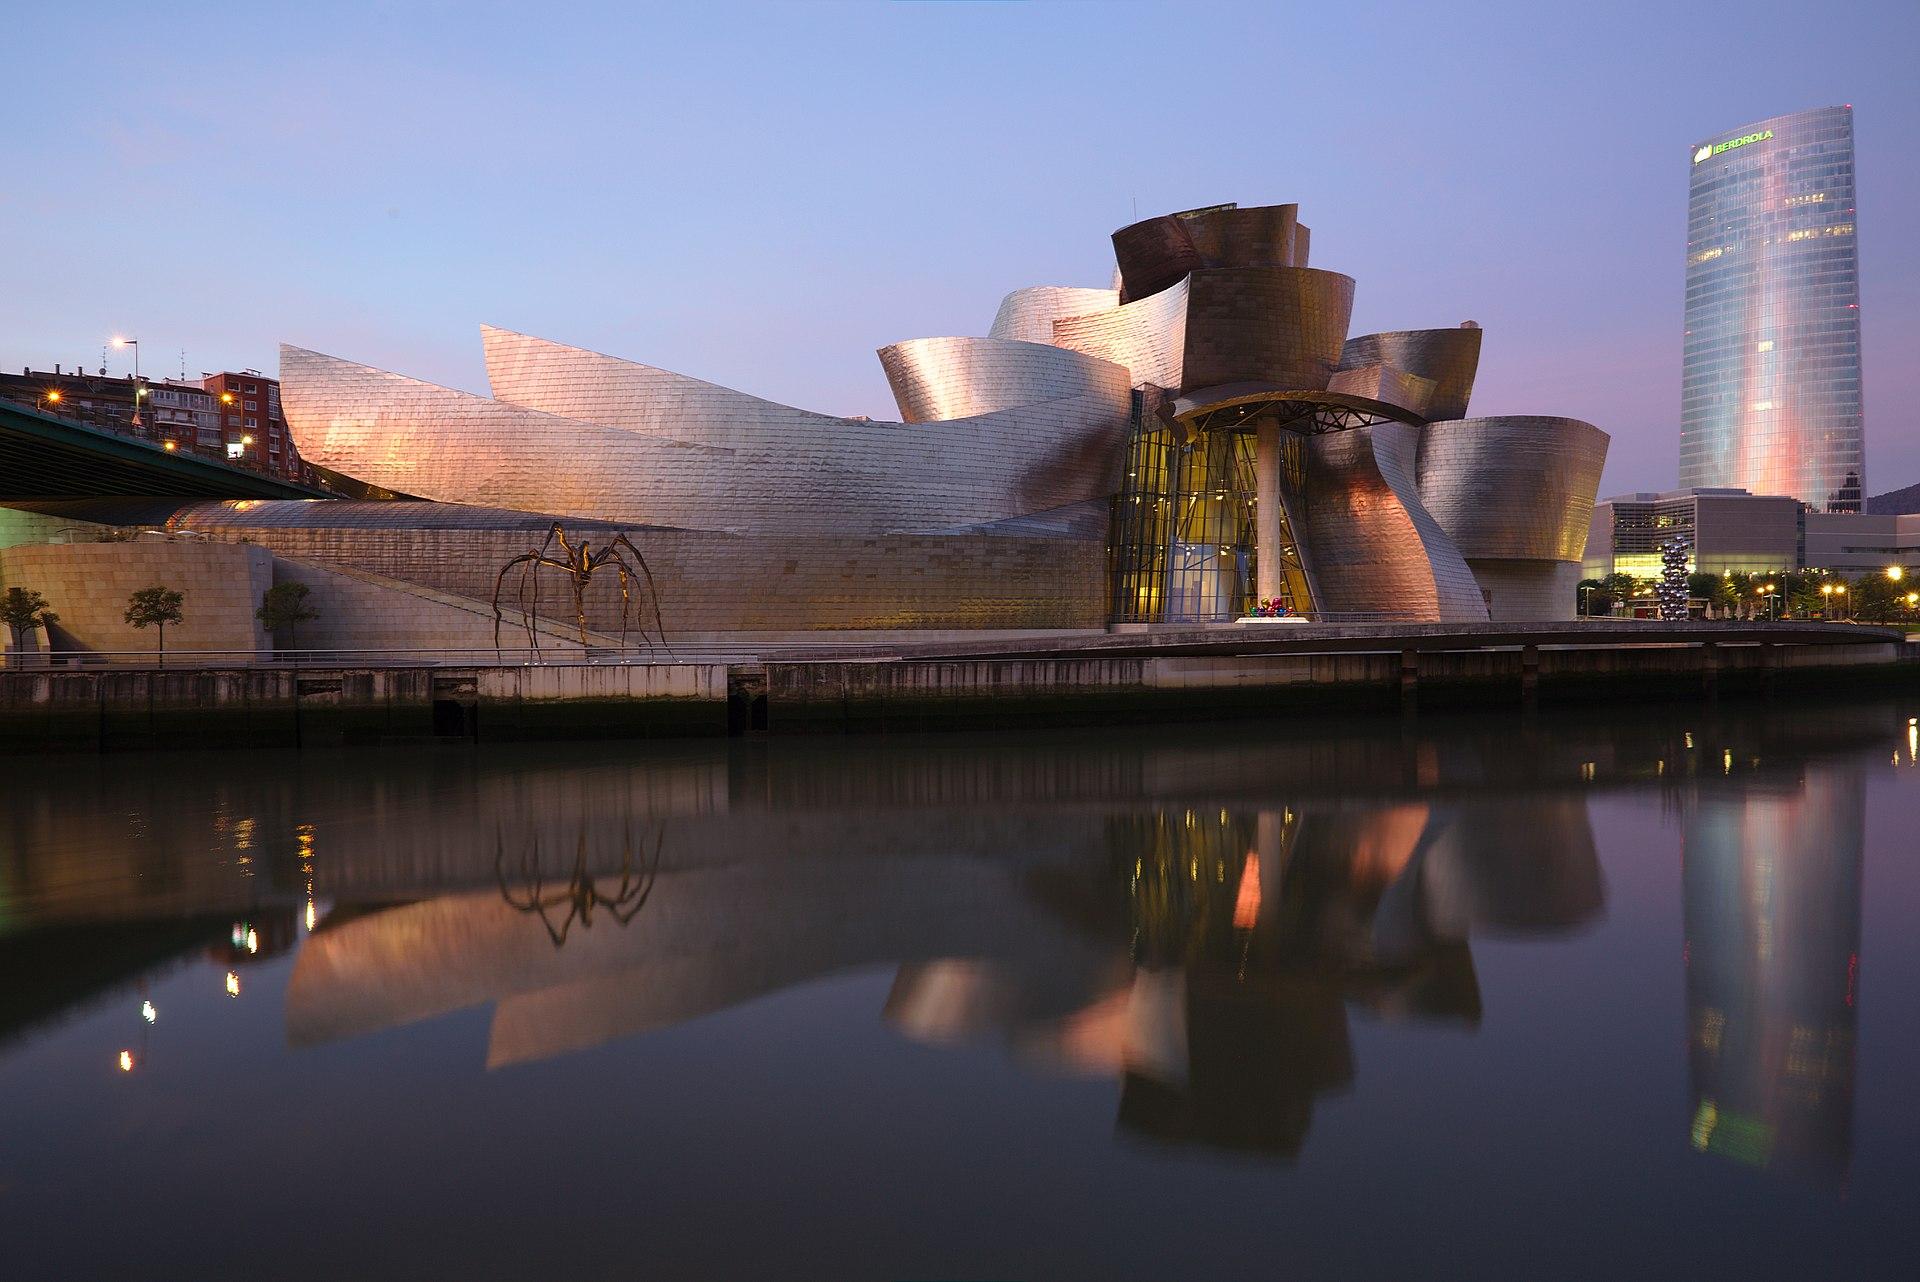 The Guggenheim Museum Bilbao (1997) in Bilbao, Spain by Frank Gehry